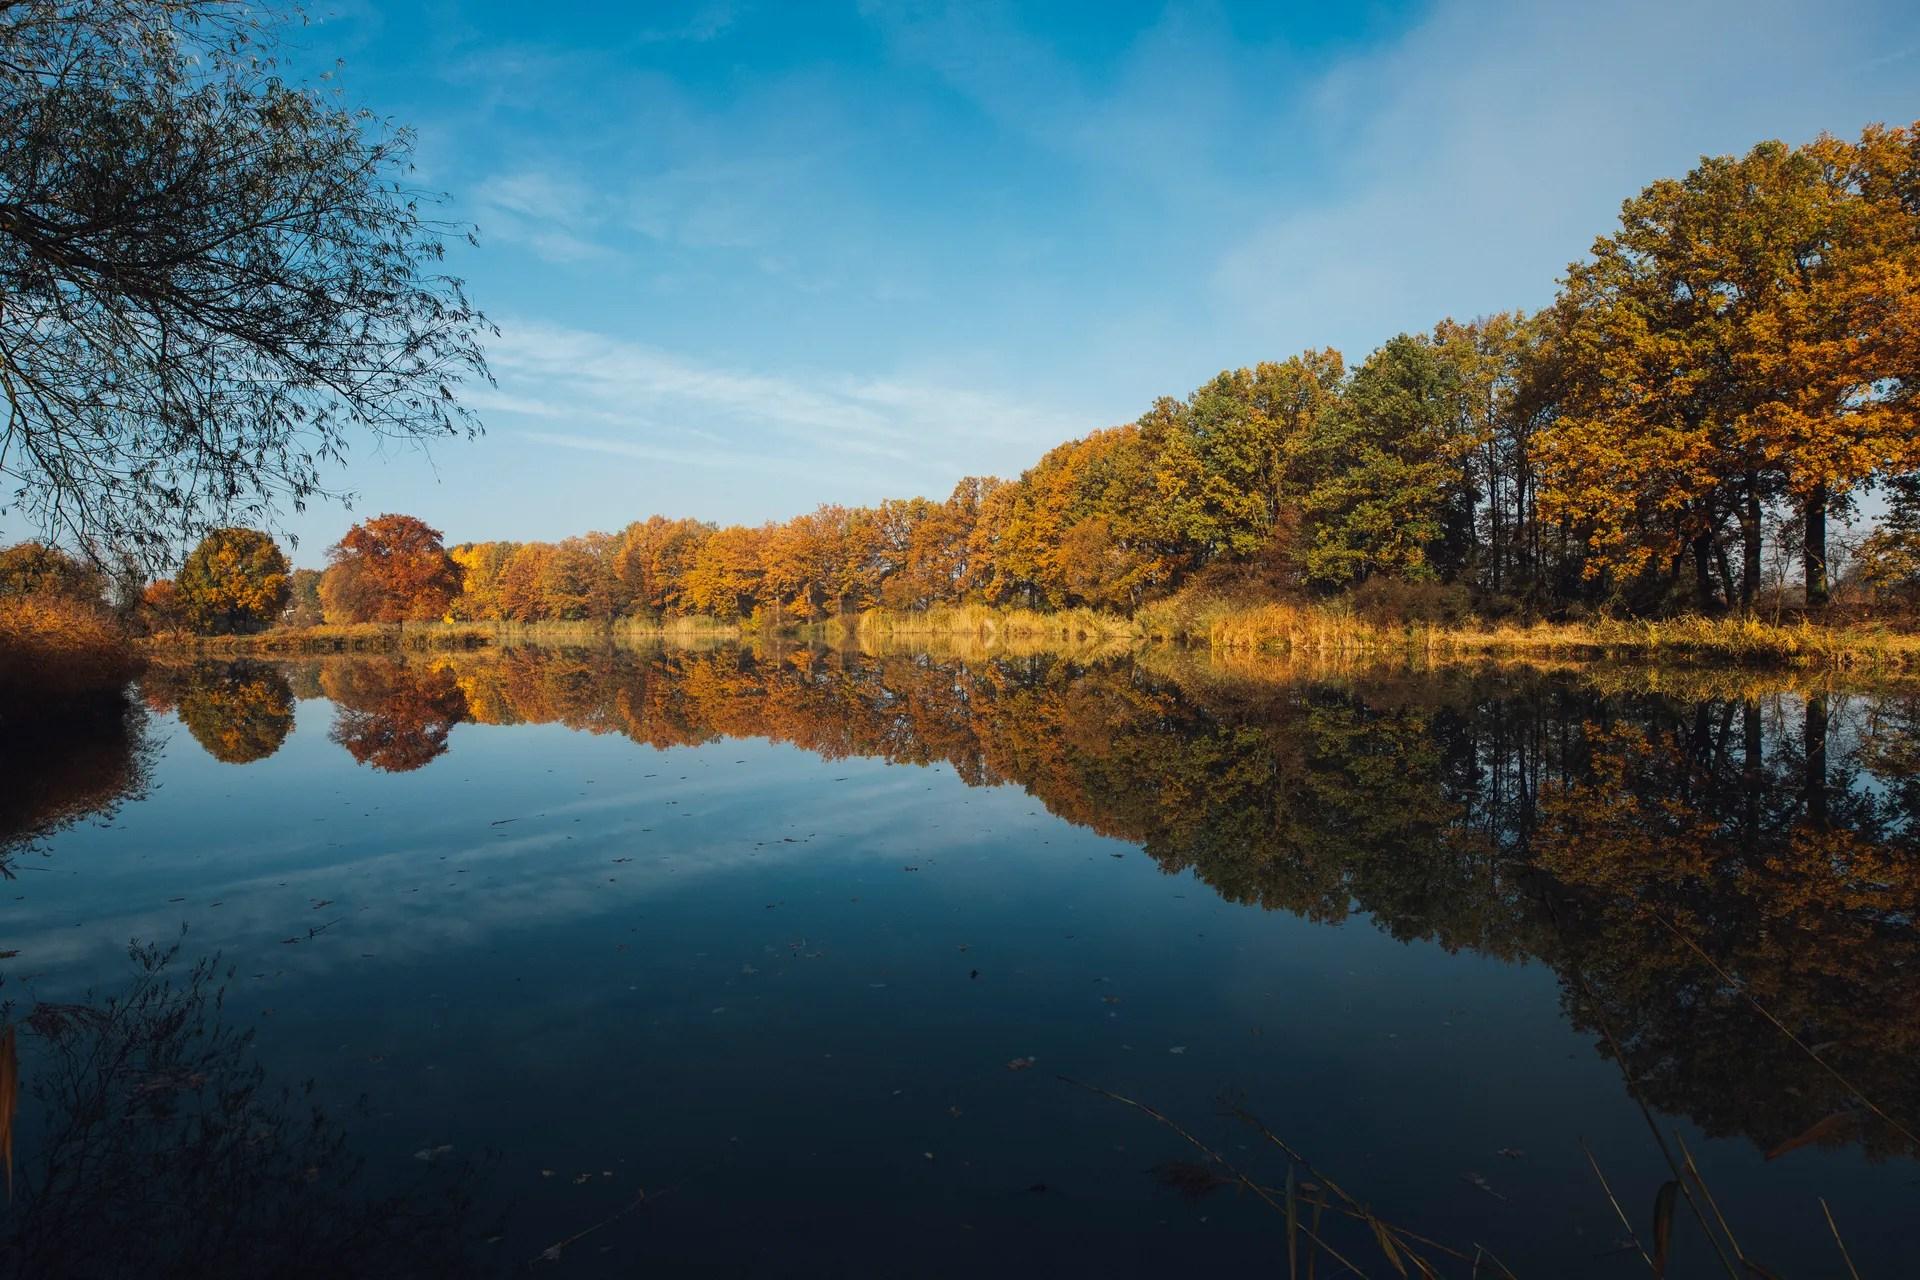 Winnie The Pooh Fall Wallpaper Parade At Magic Kingdom Walt Disney World The Seven